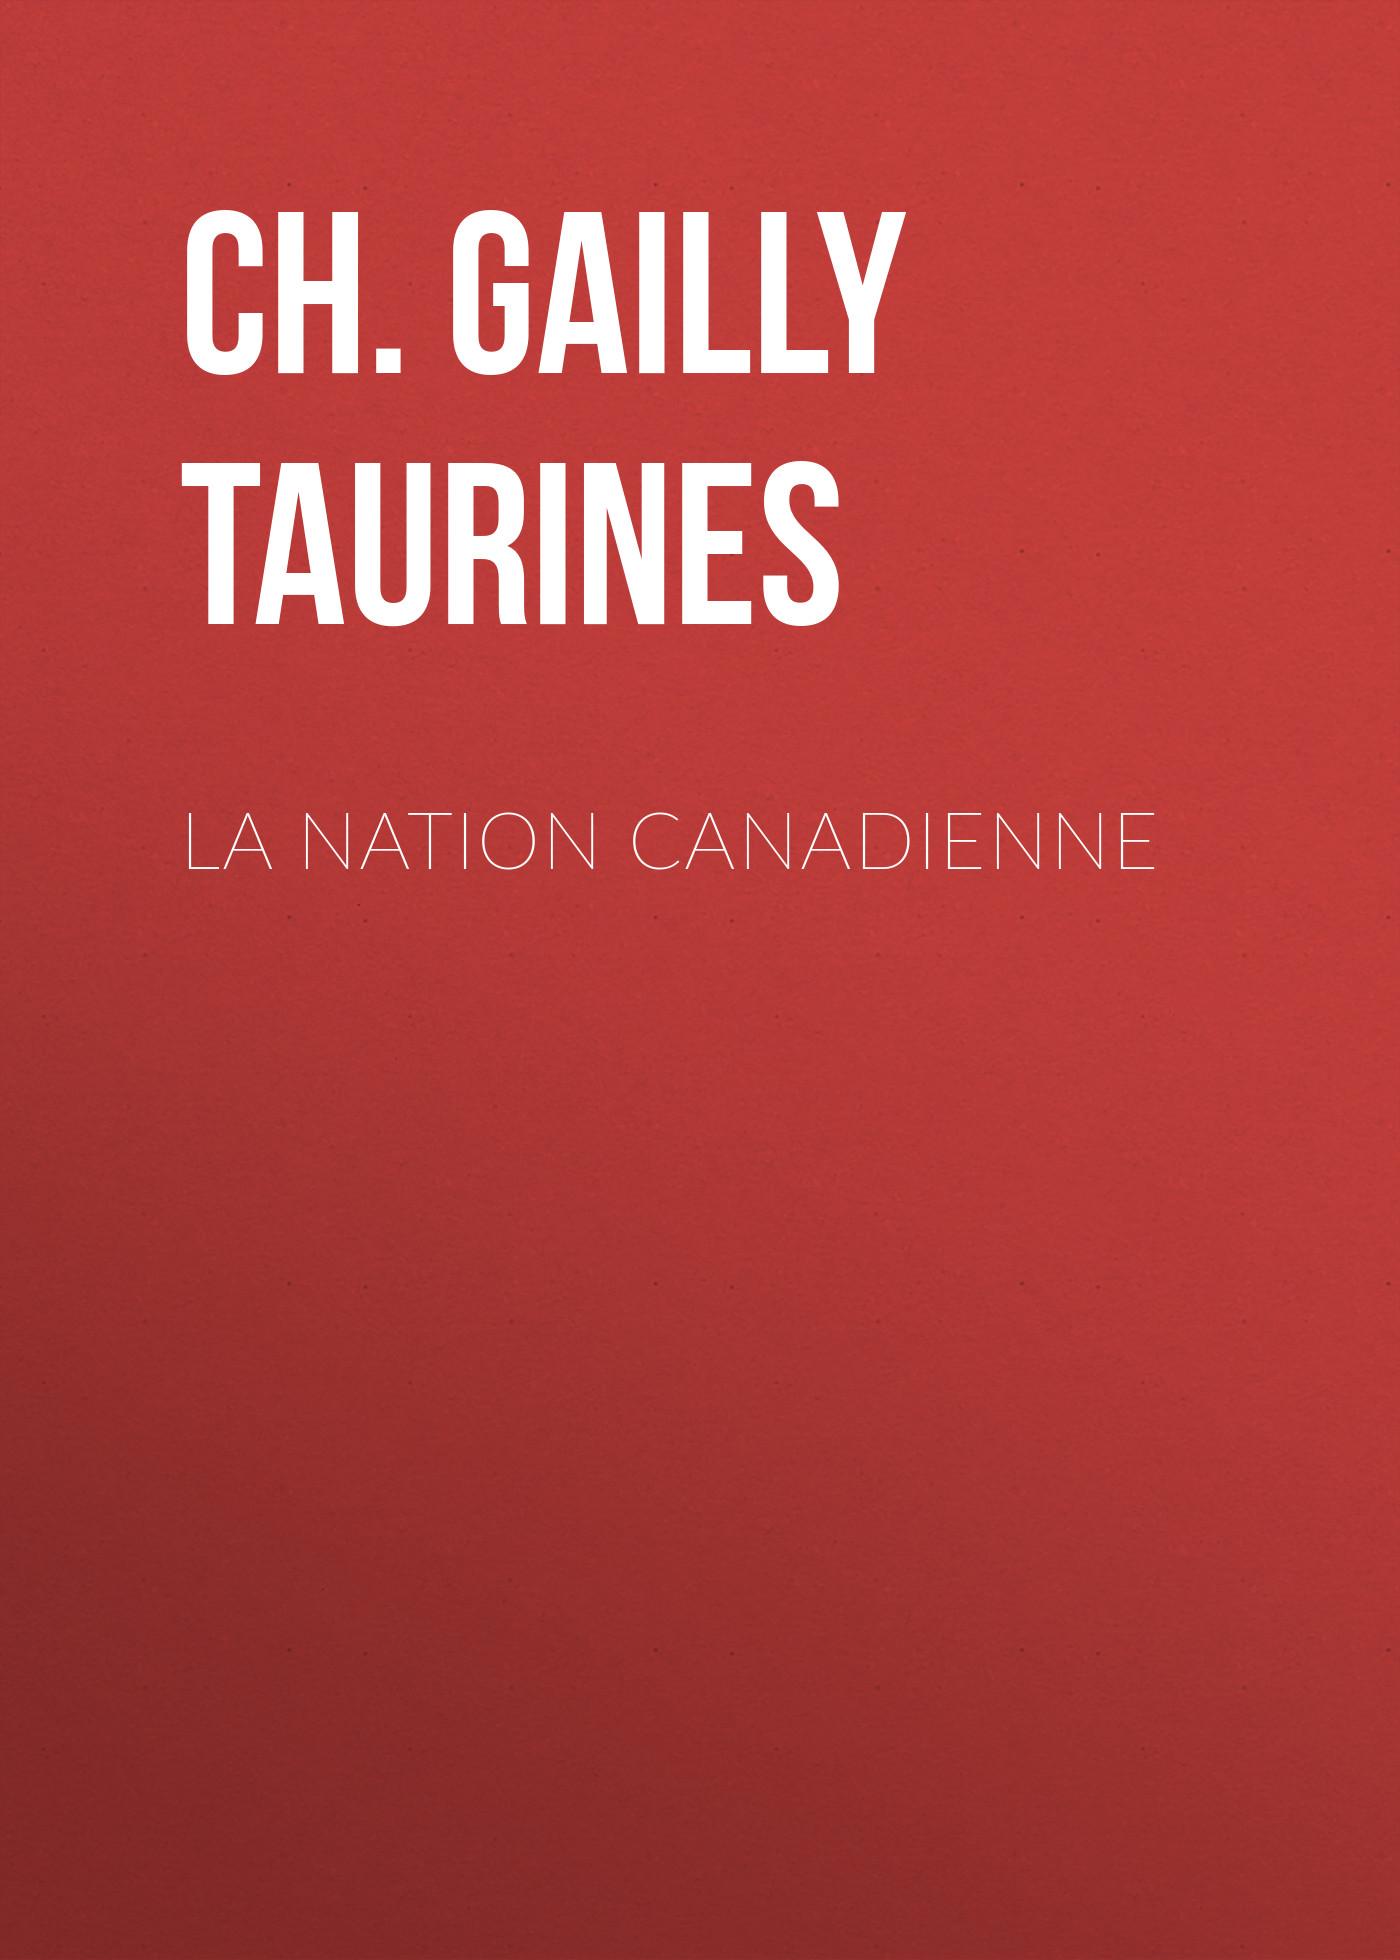 цена на Ch. Gailly de Taurines La Nation canadienne